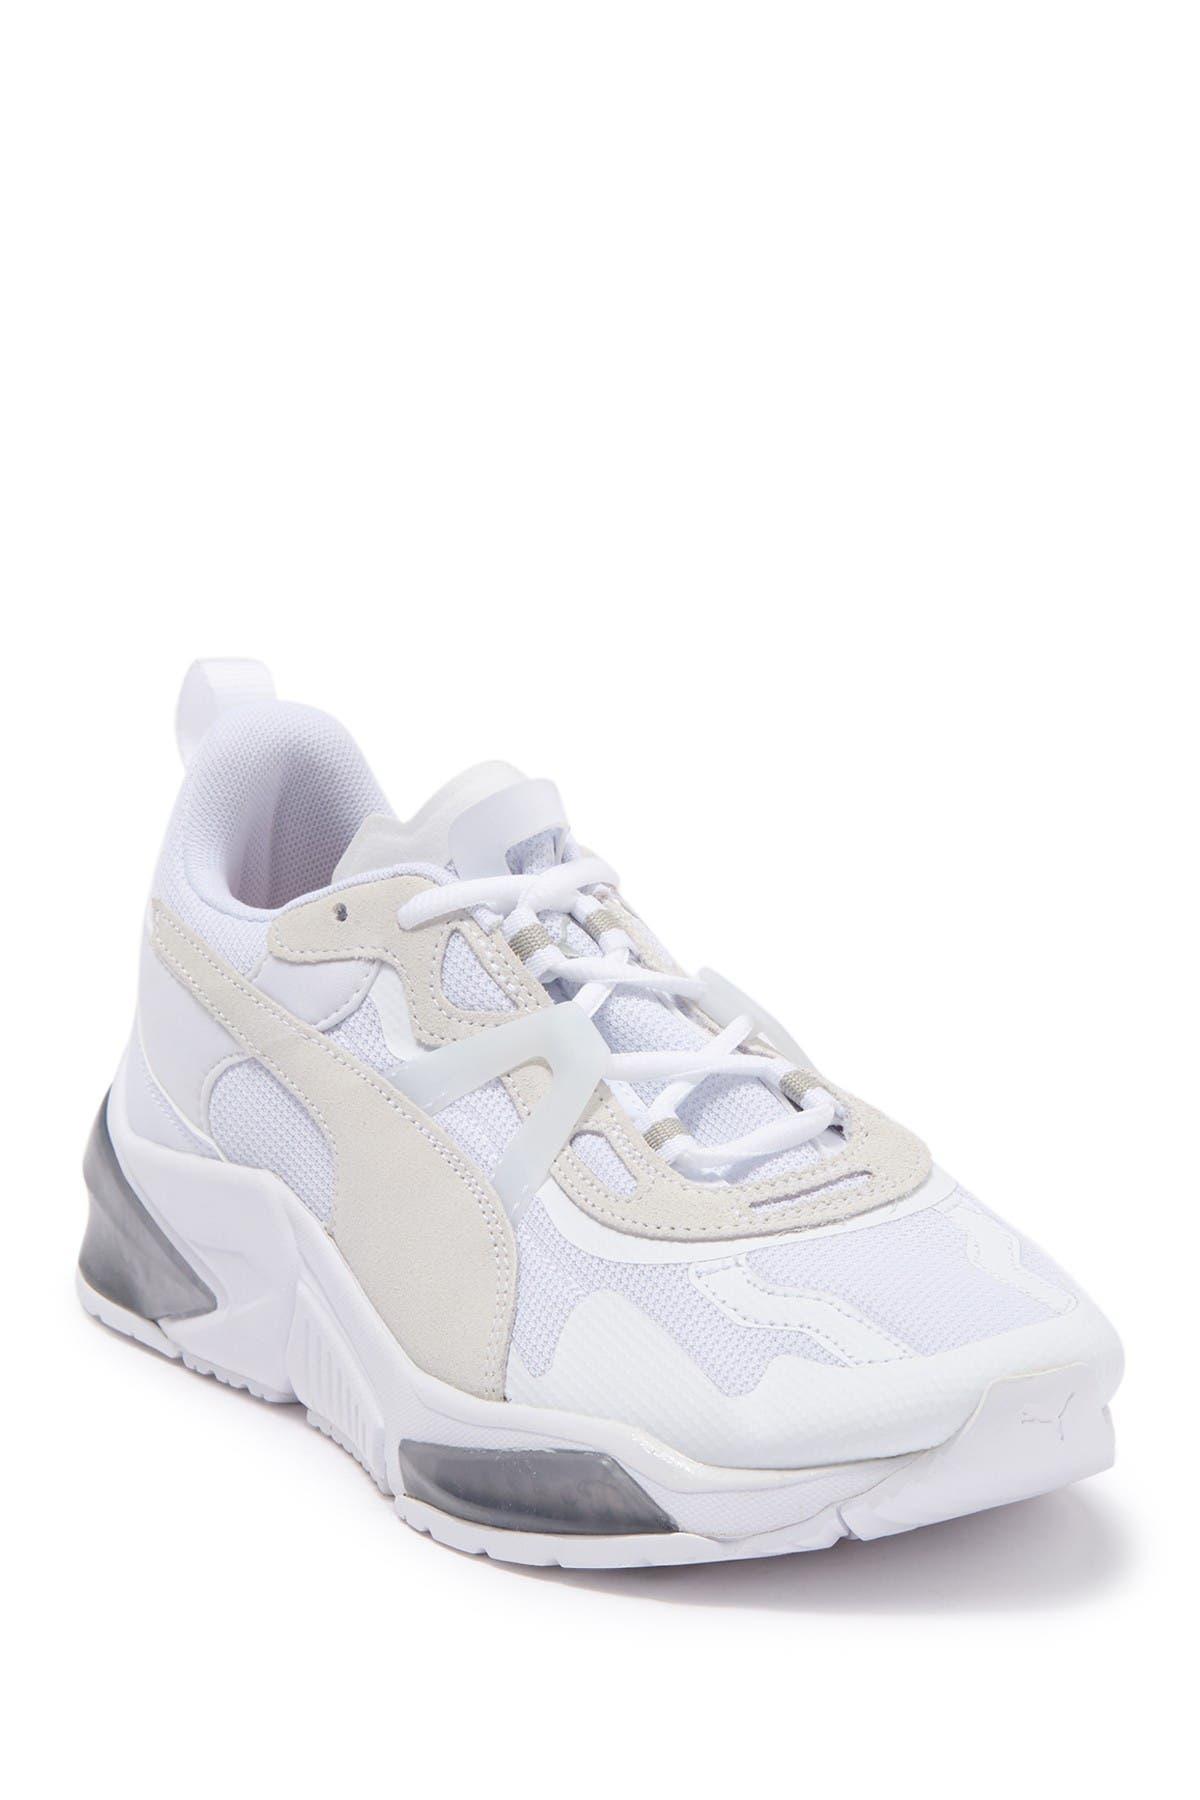 Image of PUMA LQDCELL Optic Pax Sneaker